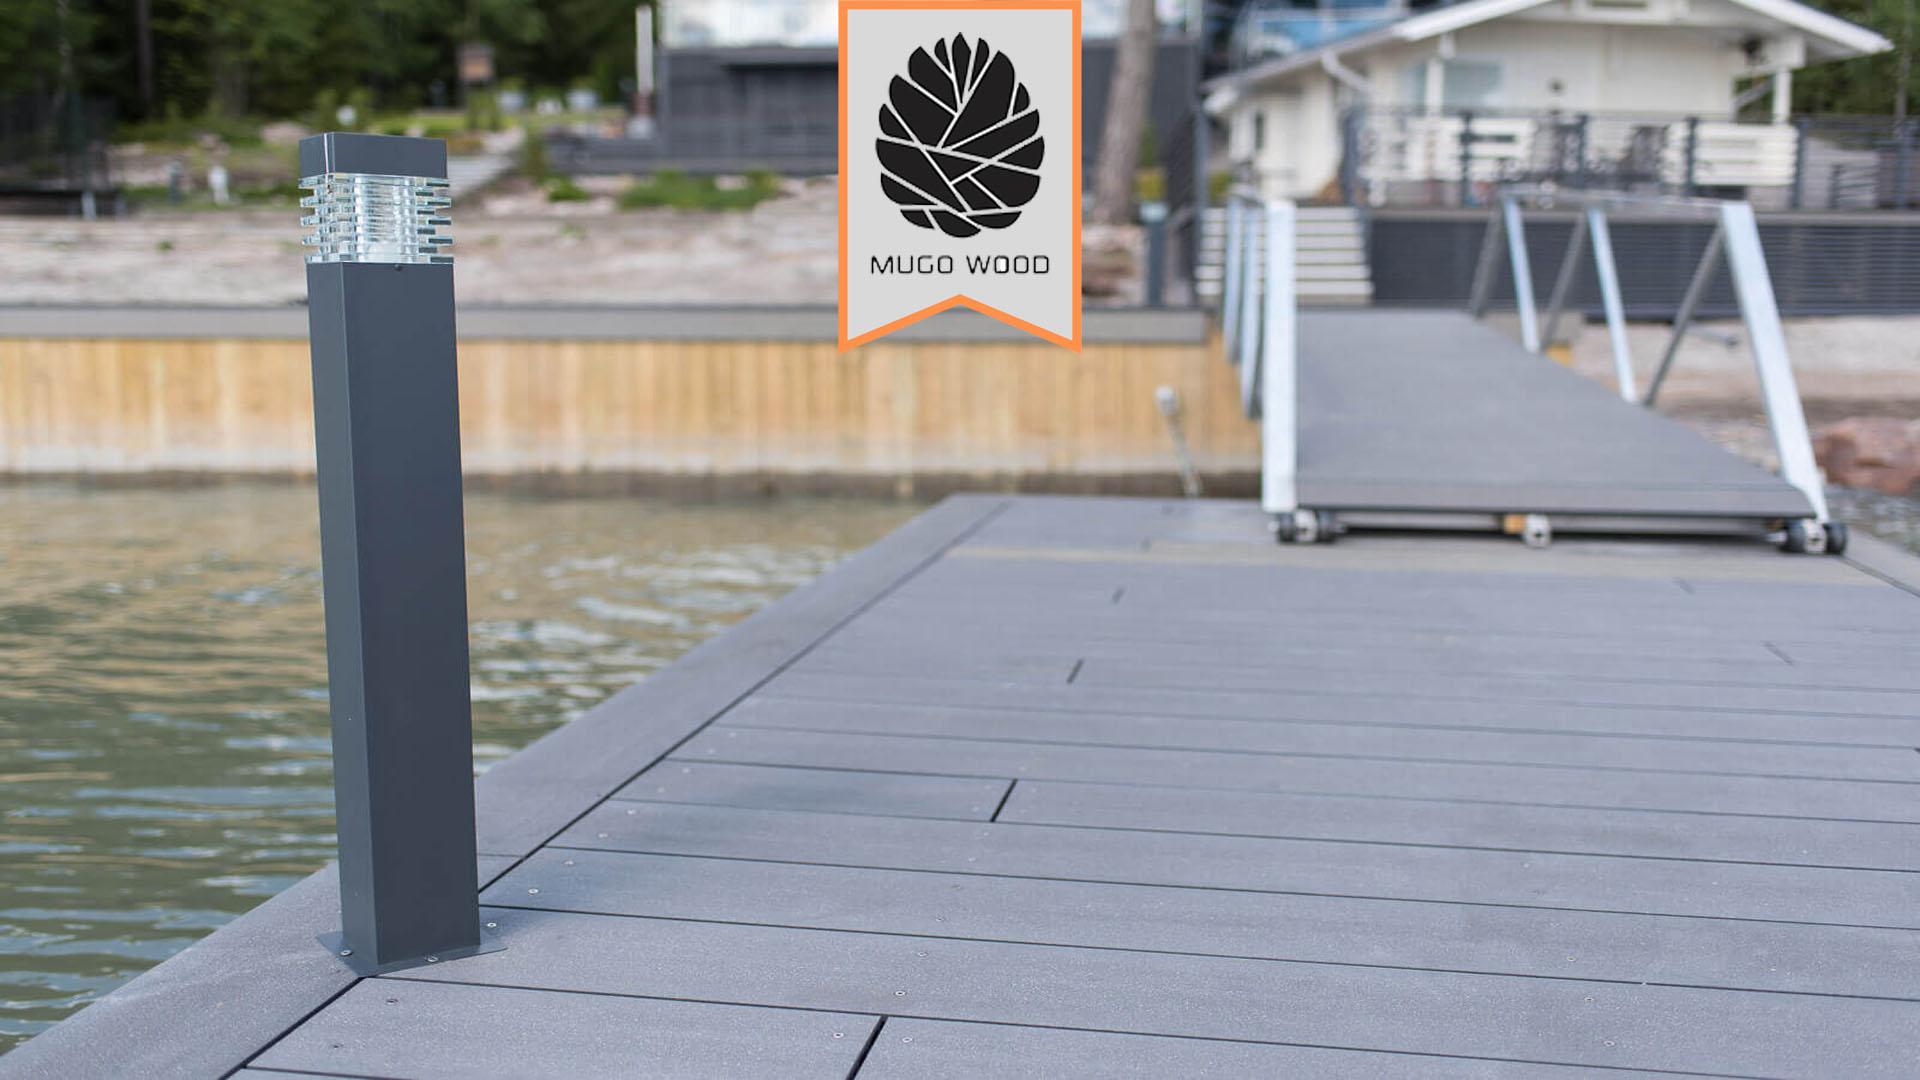 چوب ترموود فنلاندی سایز 92*42 - ترموود فنلانذدی - چوب ترموود فنلاندی - ترمووود فنلاندی - چوب ترموود - ترموود - ترمووود - چوب ترمو - چوب ترموود - ترموود ایرانی